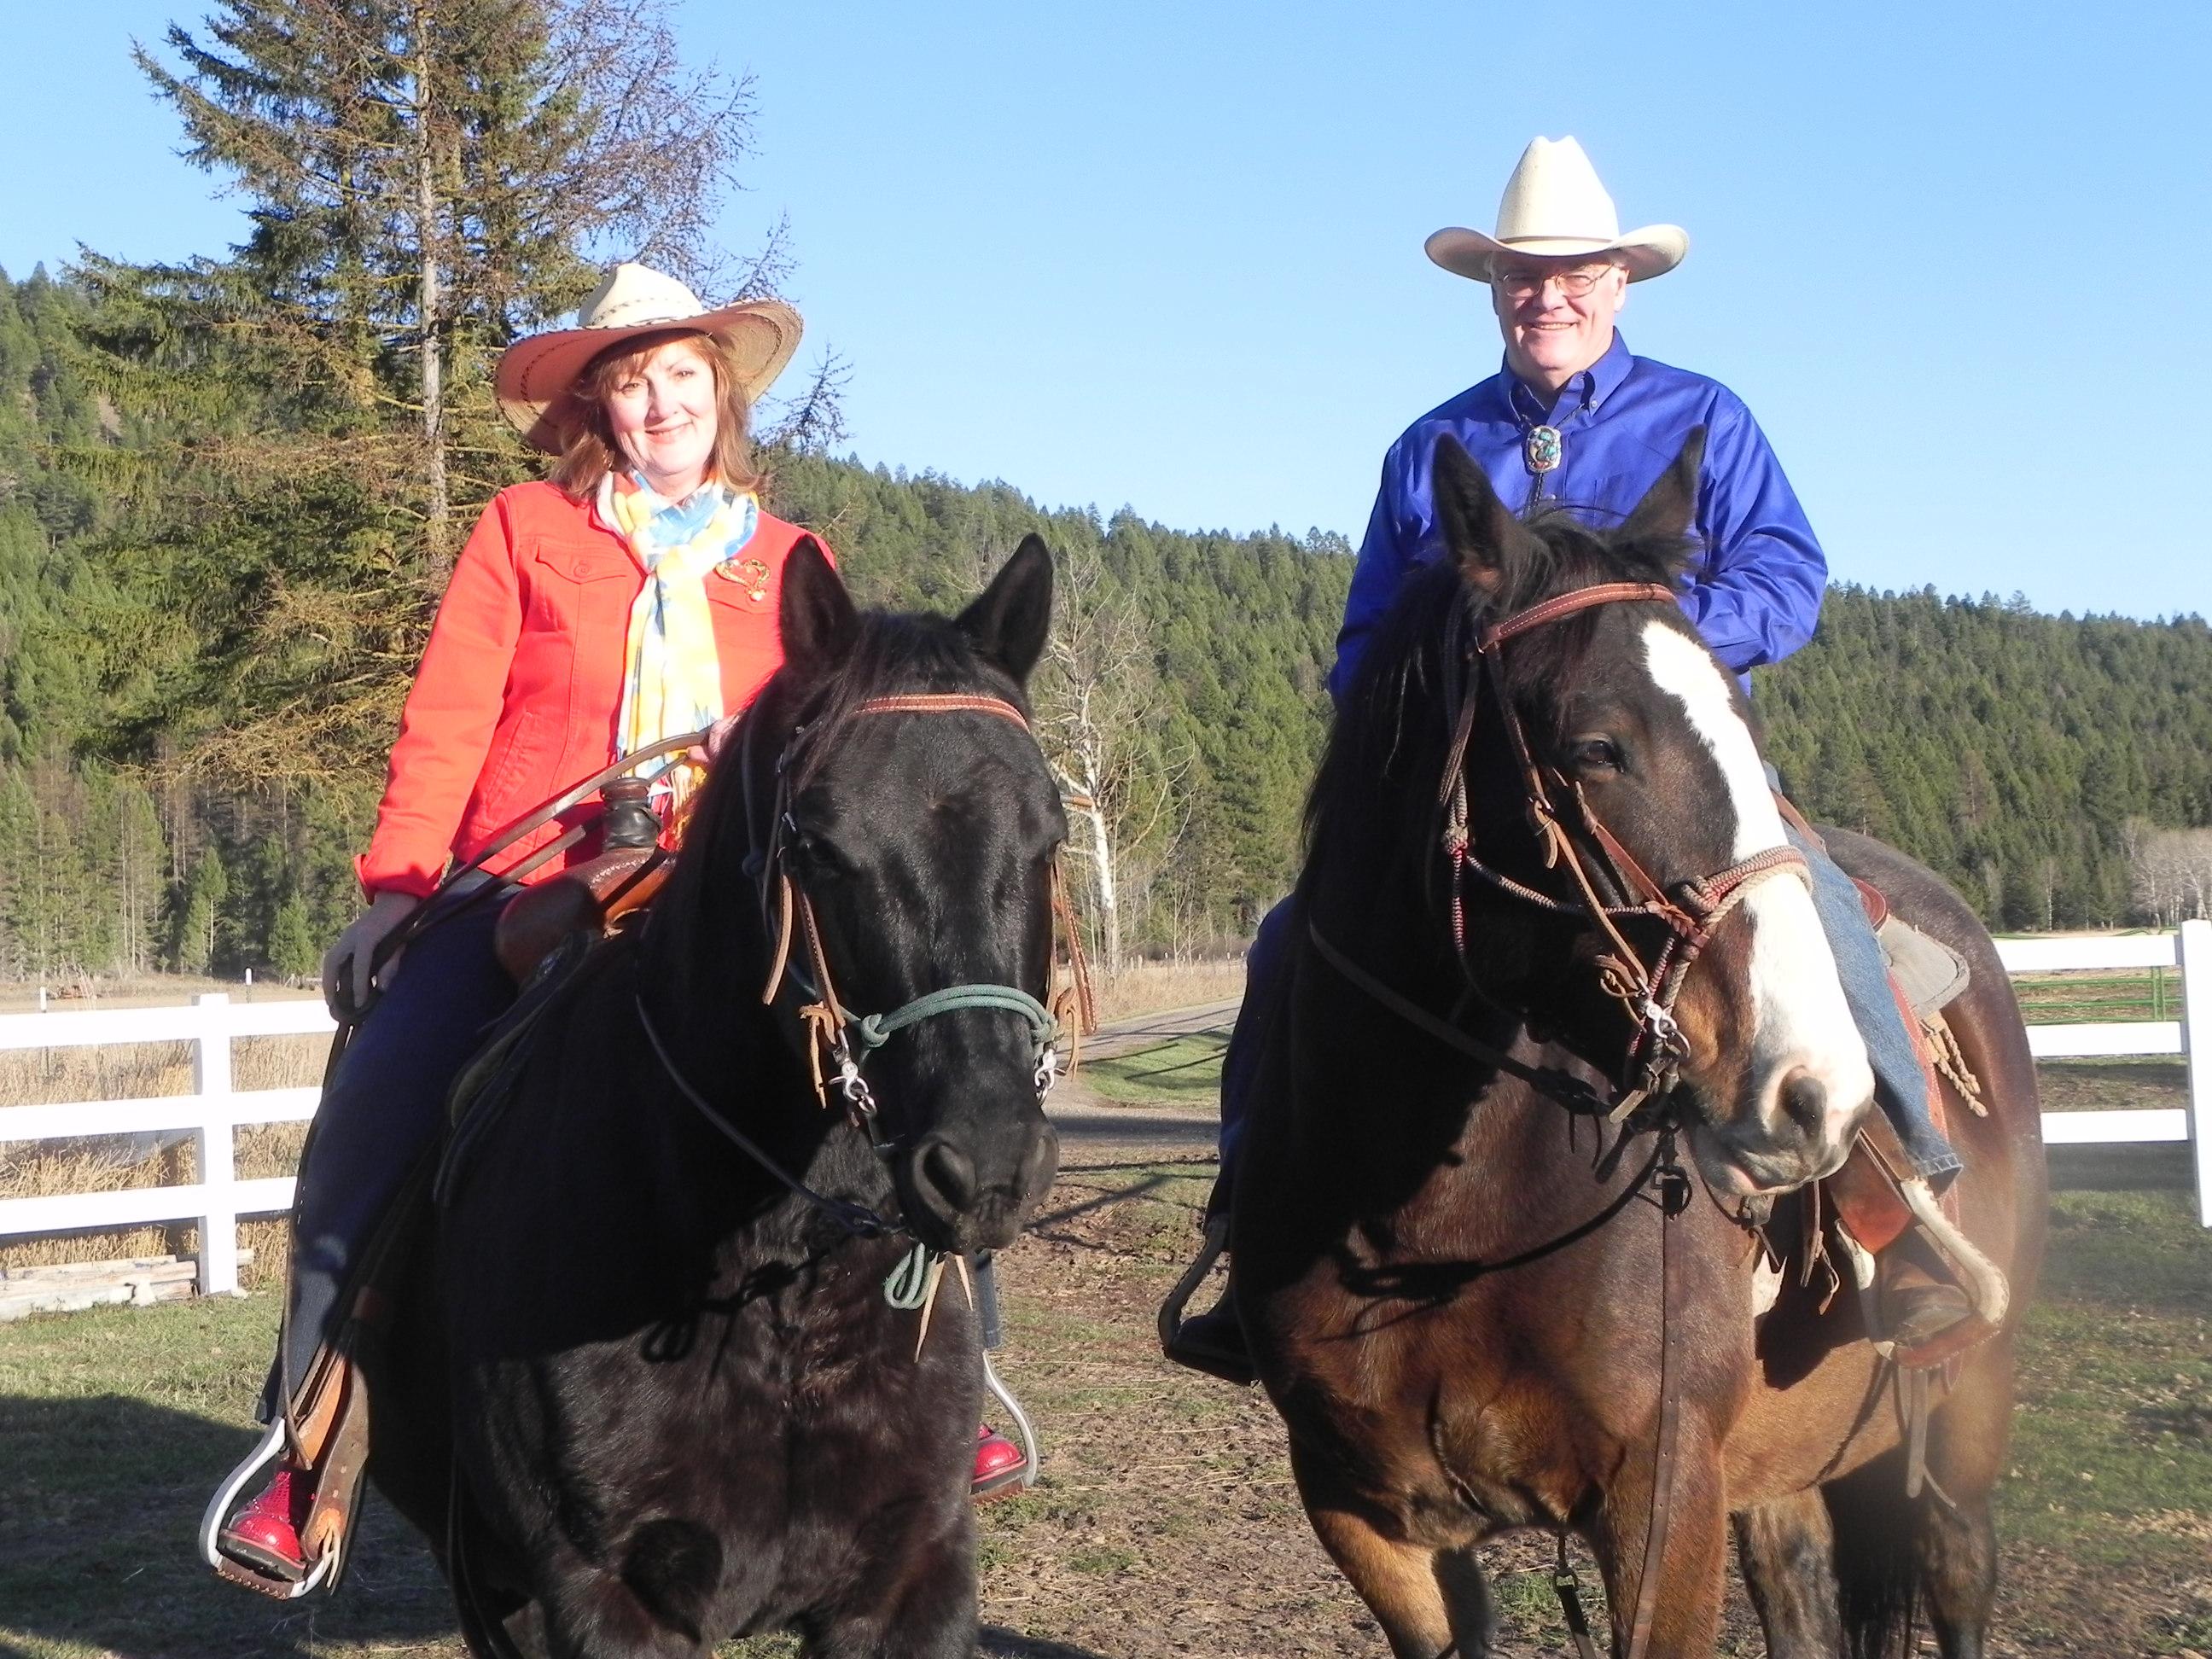 Gaynor Ranch & Resort, Whitefish MT